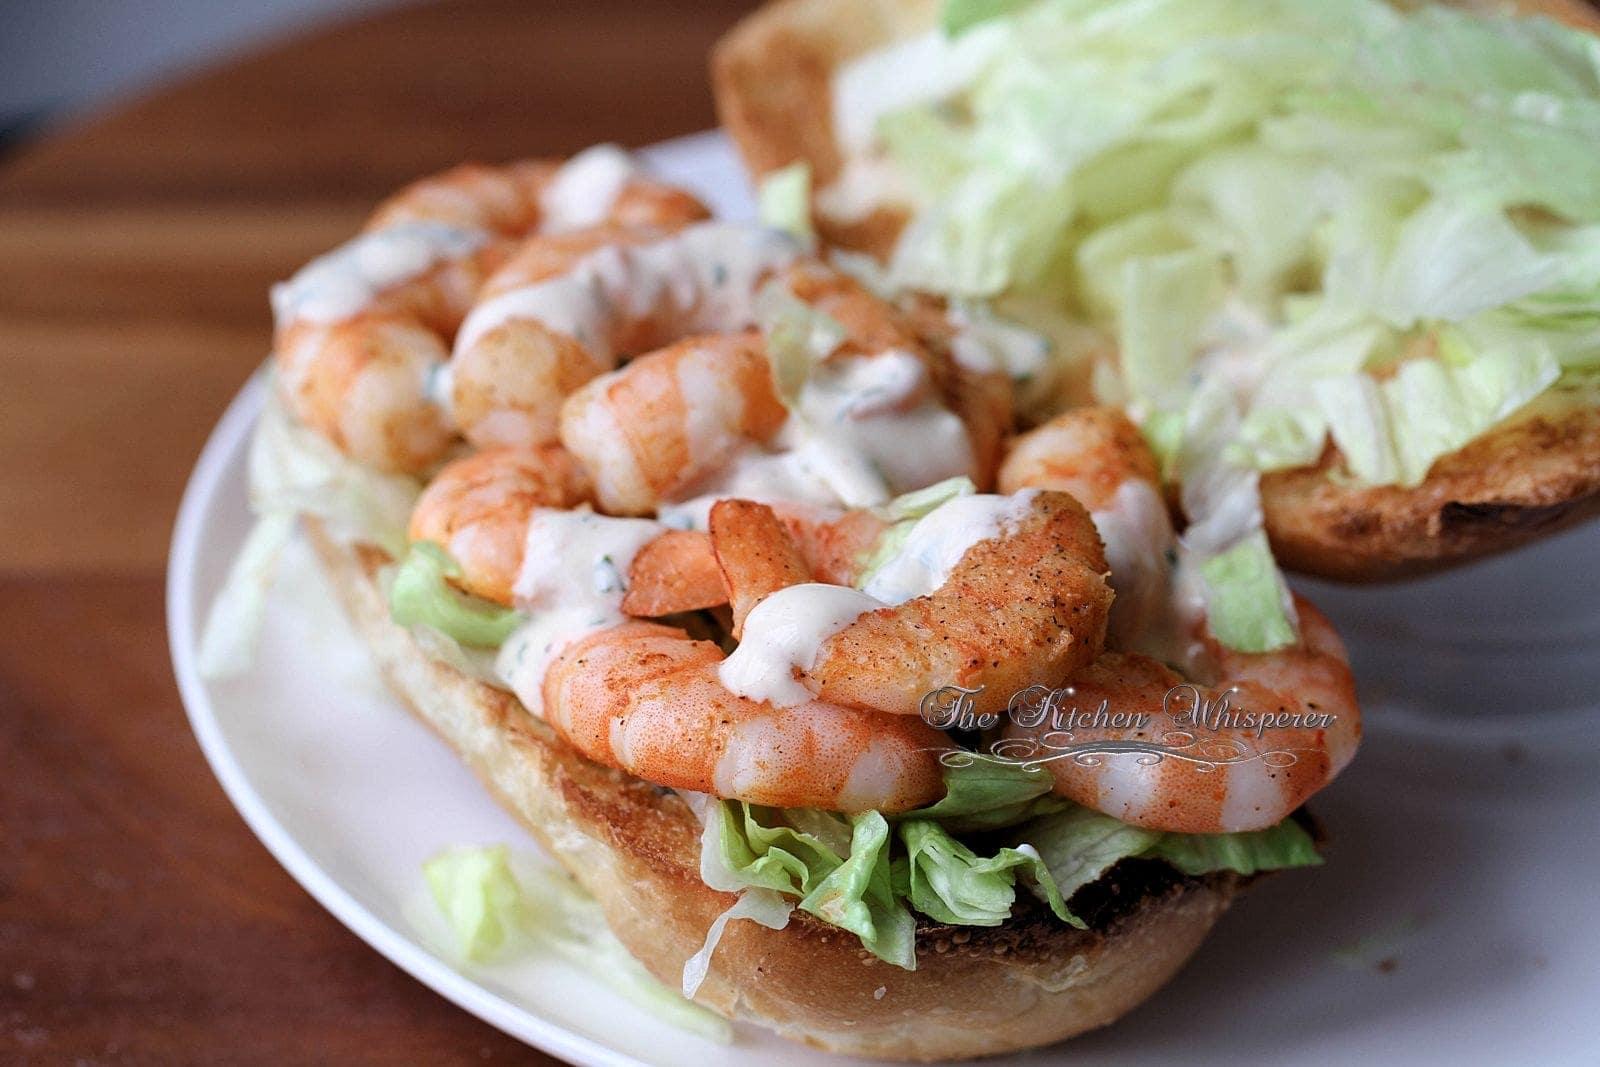 how many calories in a shrimp po boy sandwich